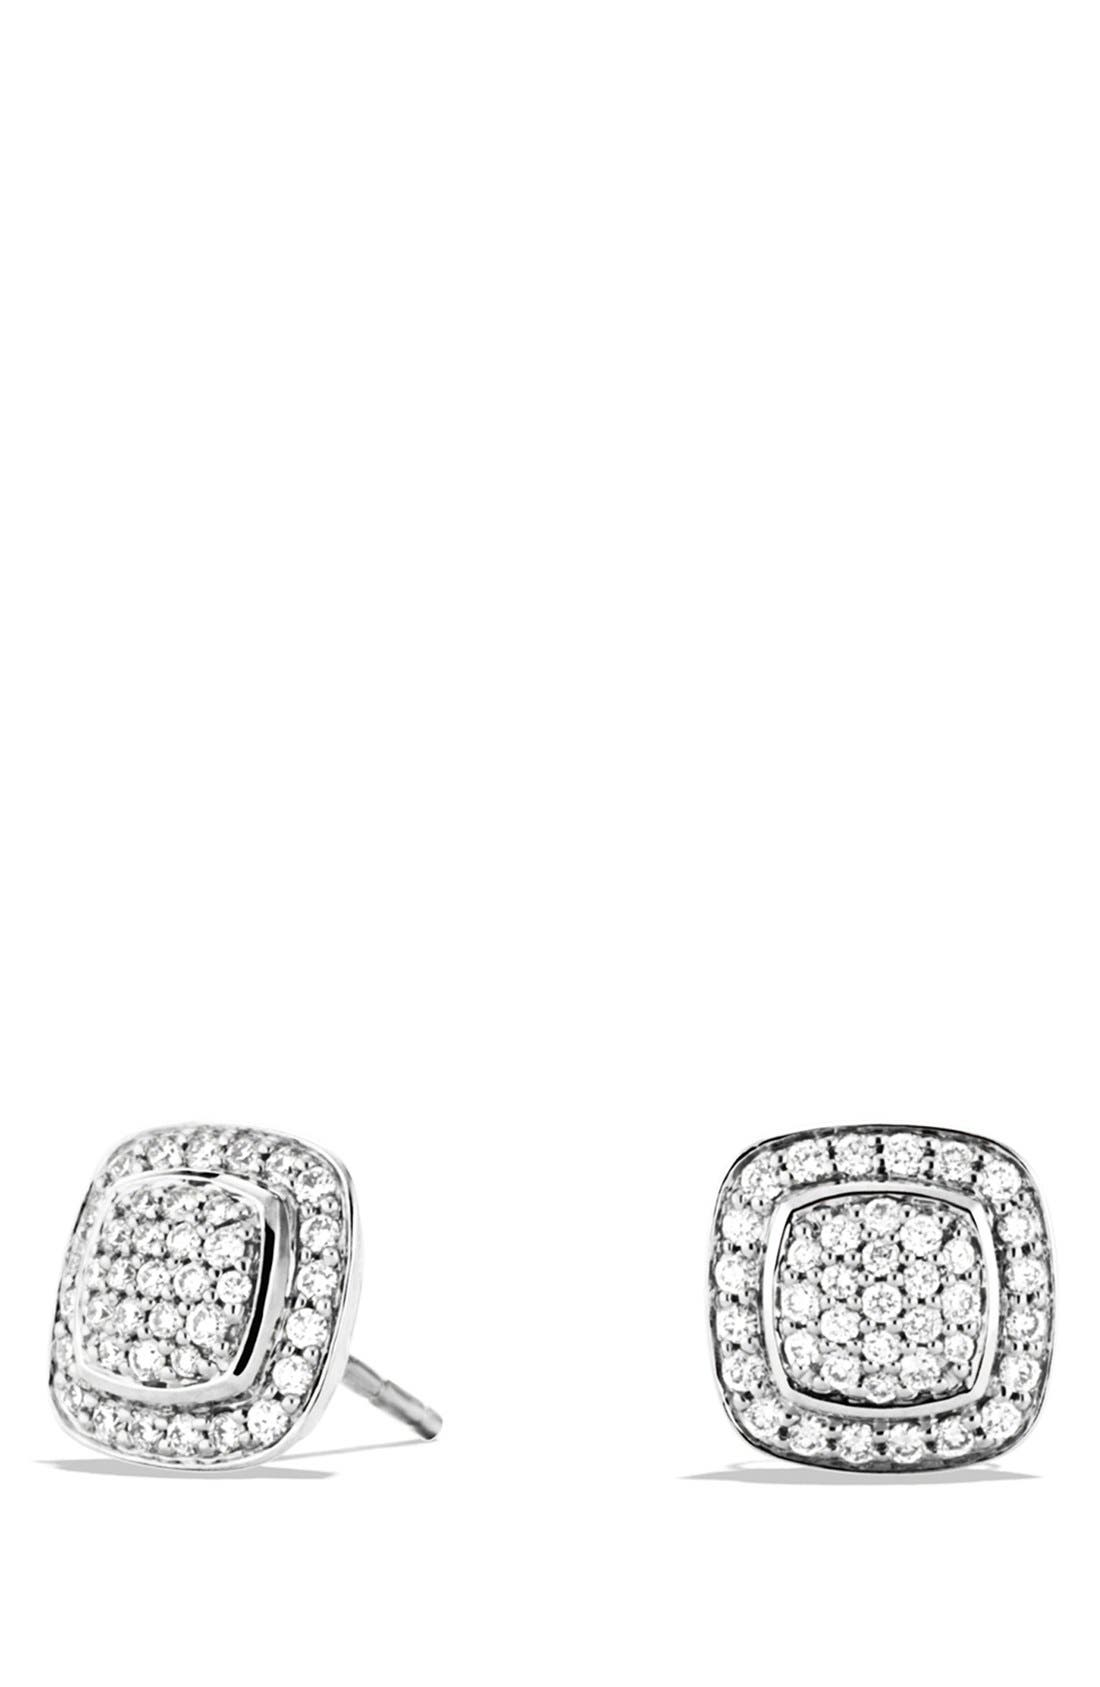 'Albion' Earrings with Diamonds,                             Main thumbnail 1, color,                             DIAMOND